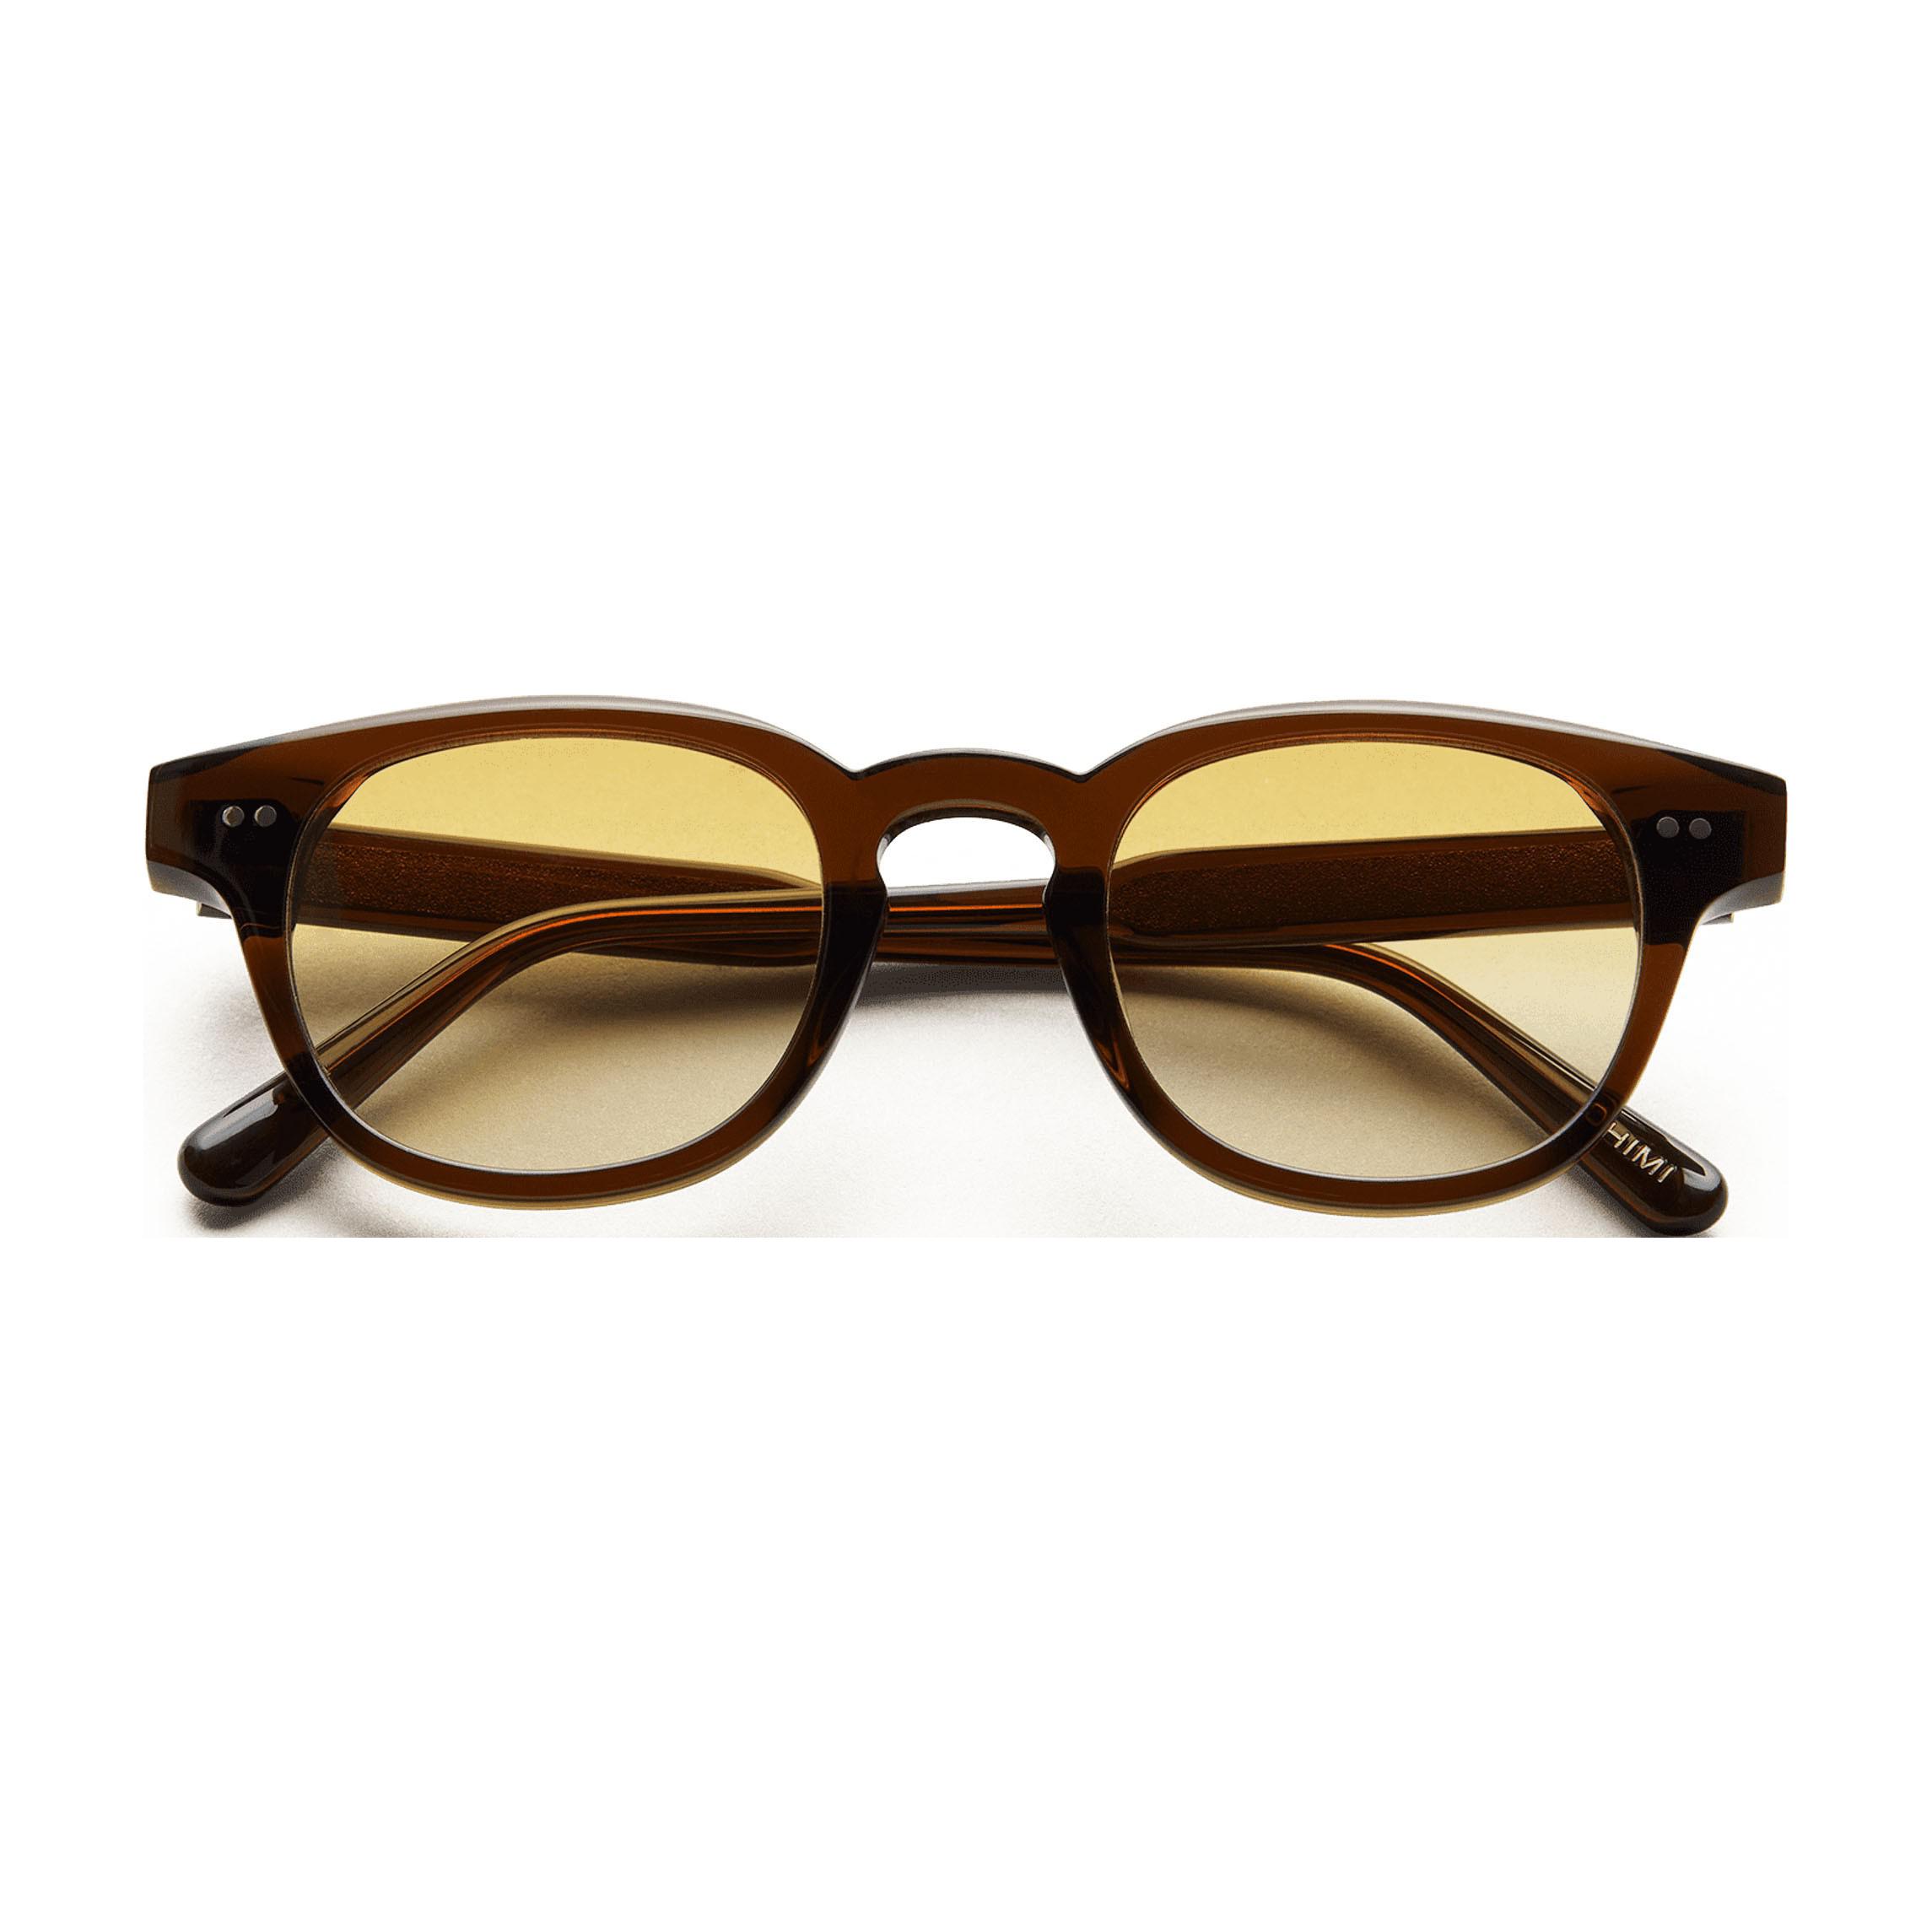 Chimi Eyewear Model 01 Brown Yellow Lenses Sunglasses 46mm Front